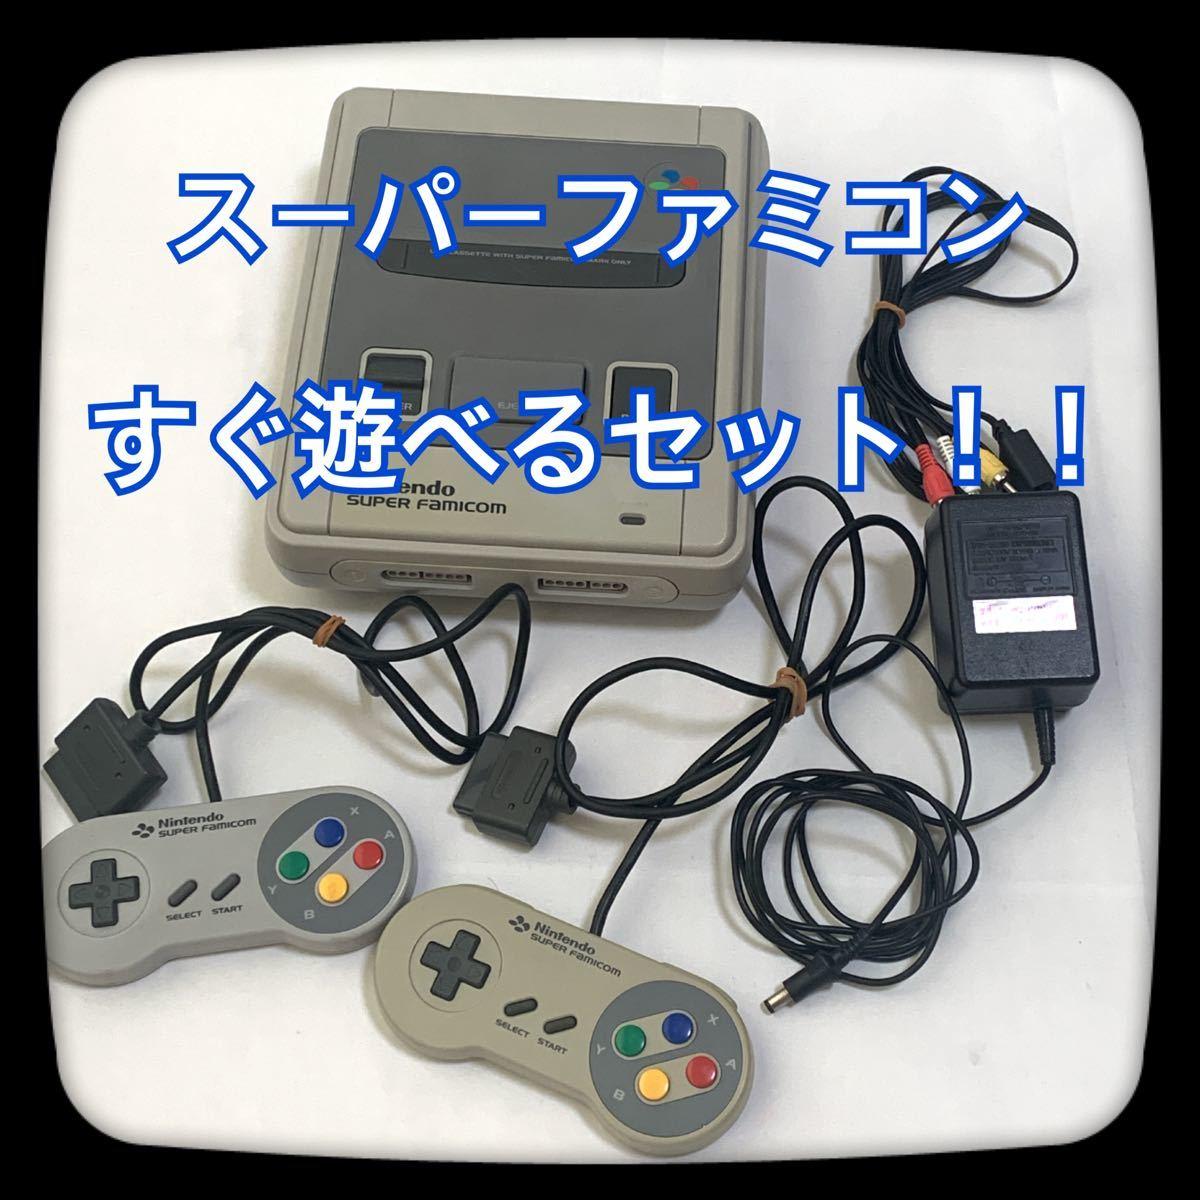 【SFC】スーパーファミコン本体セット